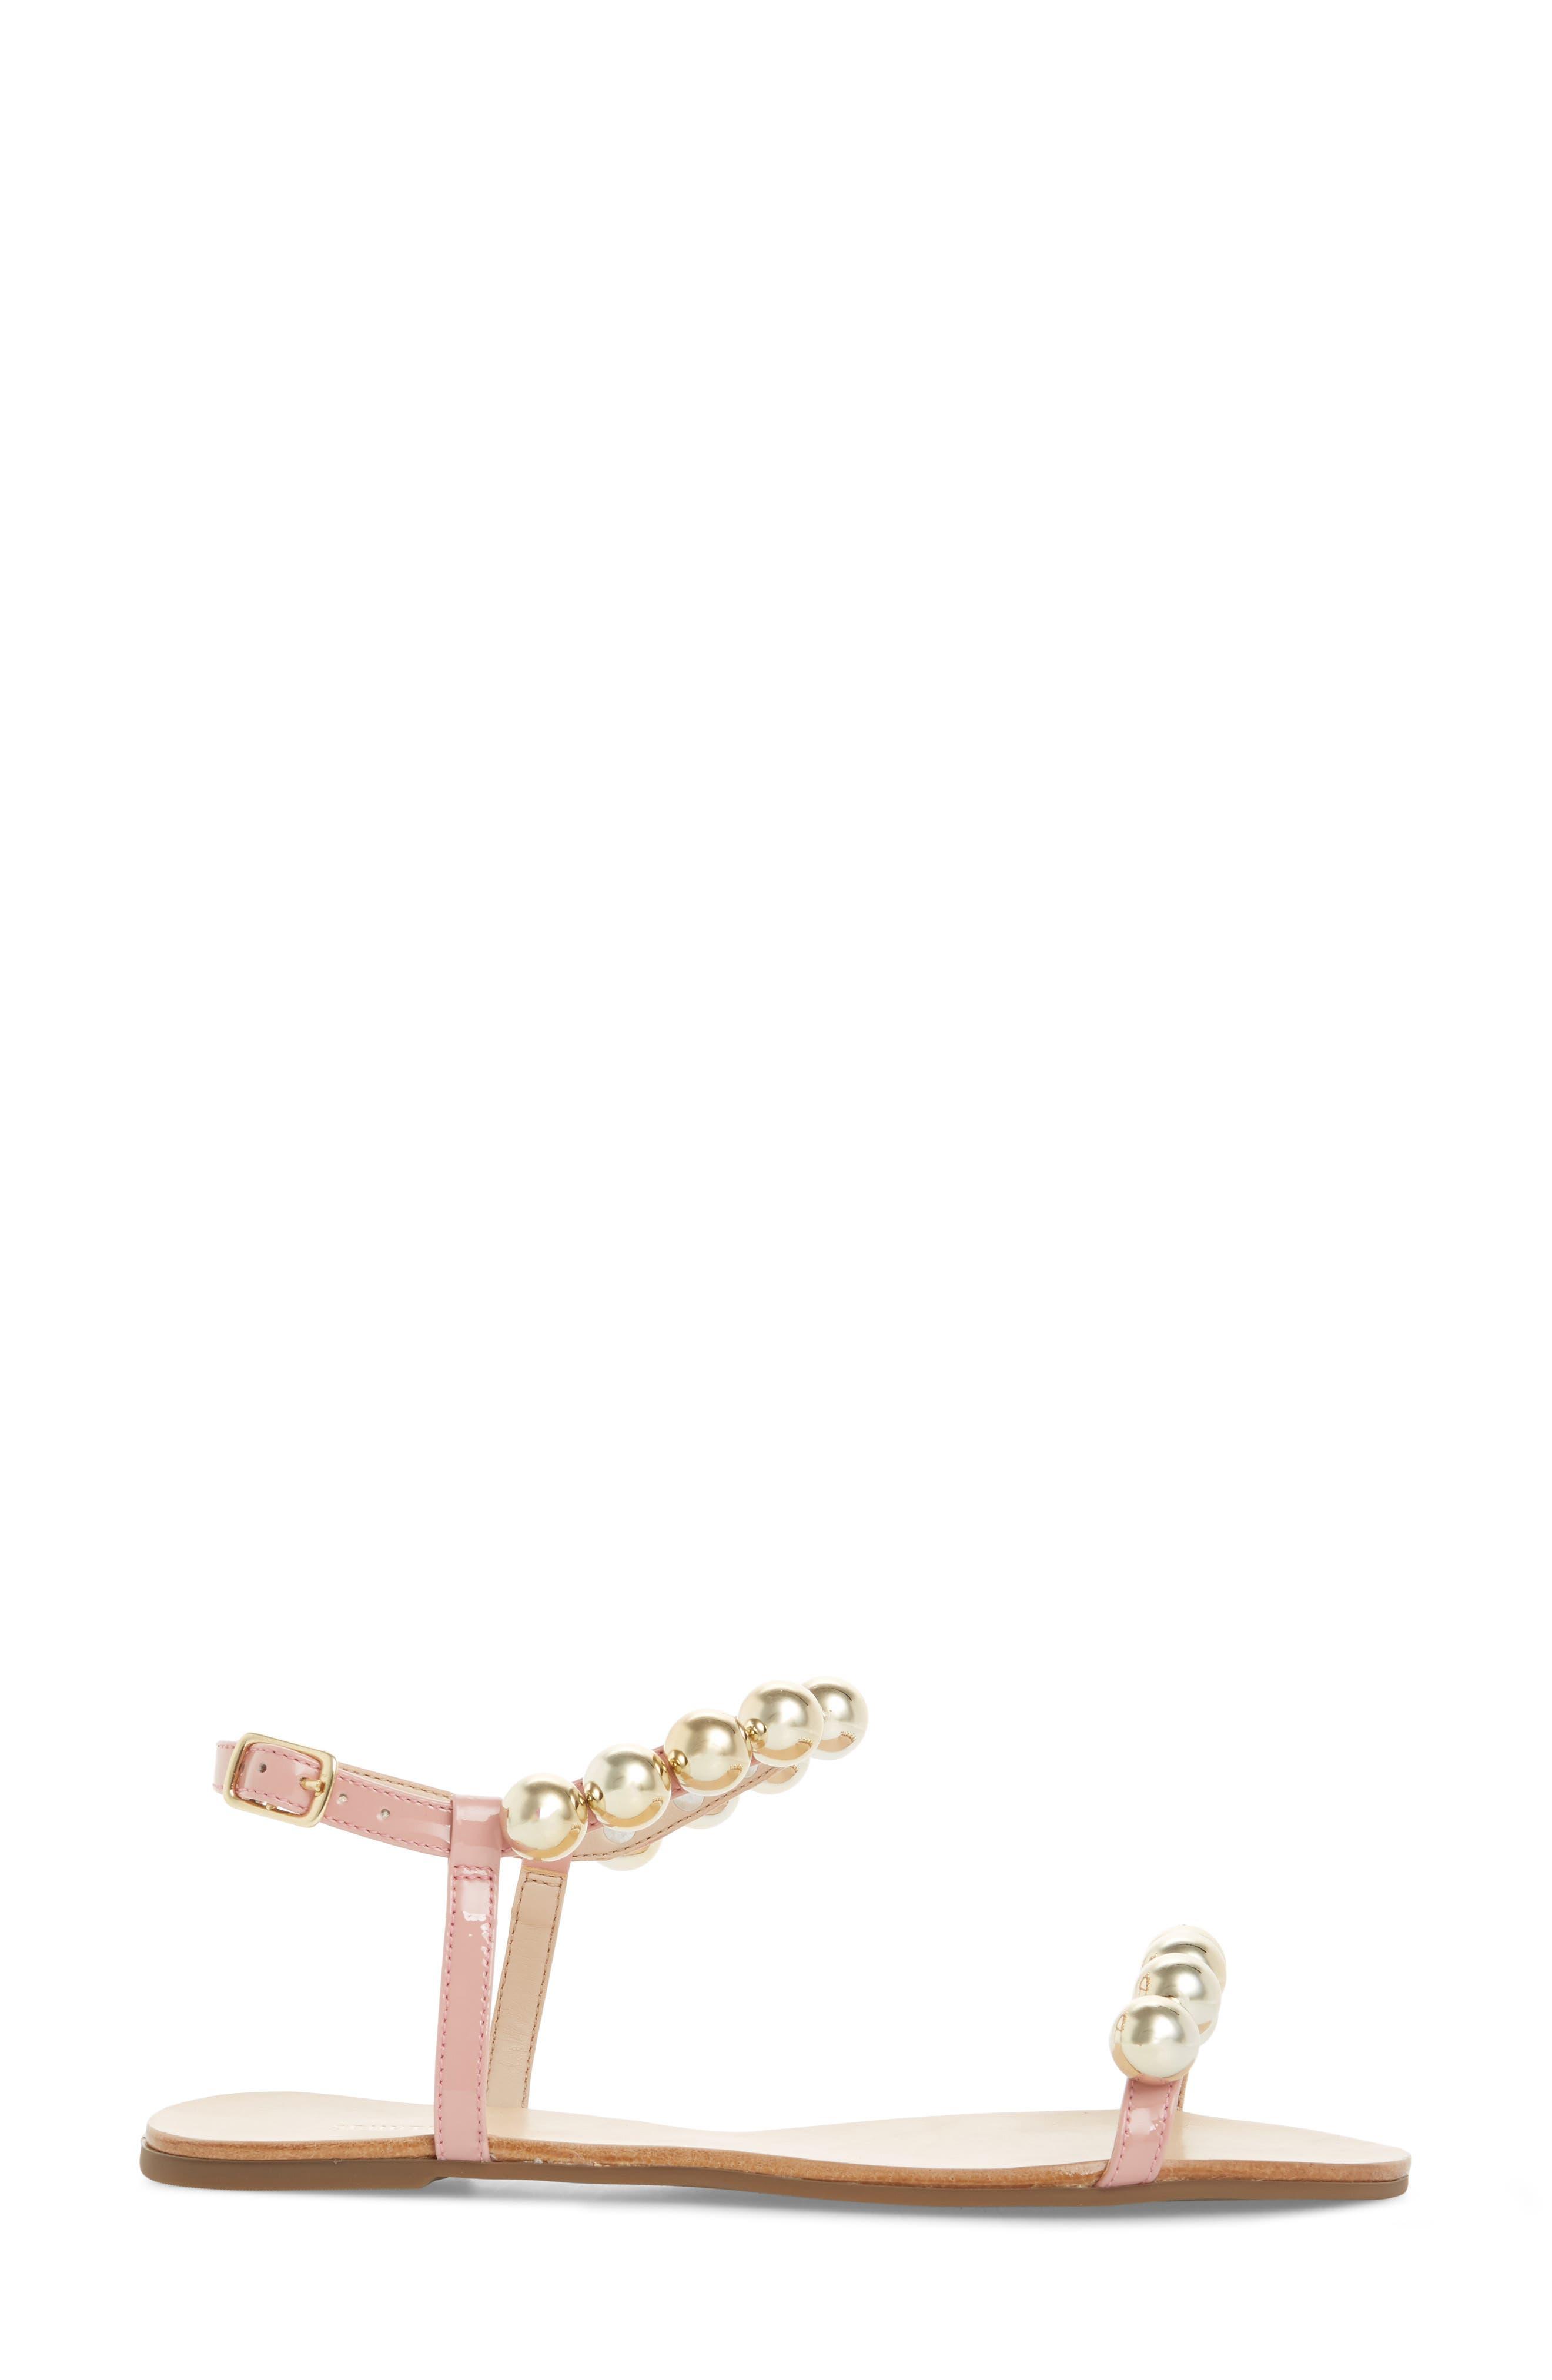 Hebe Ankle Strap Sandal,                             Alternate thumbnail 3, color,                             Poppy Rose Leather